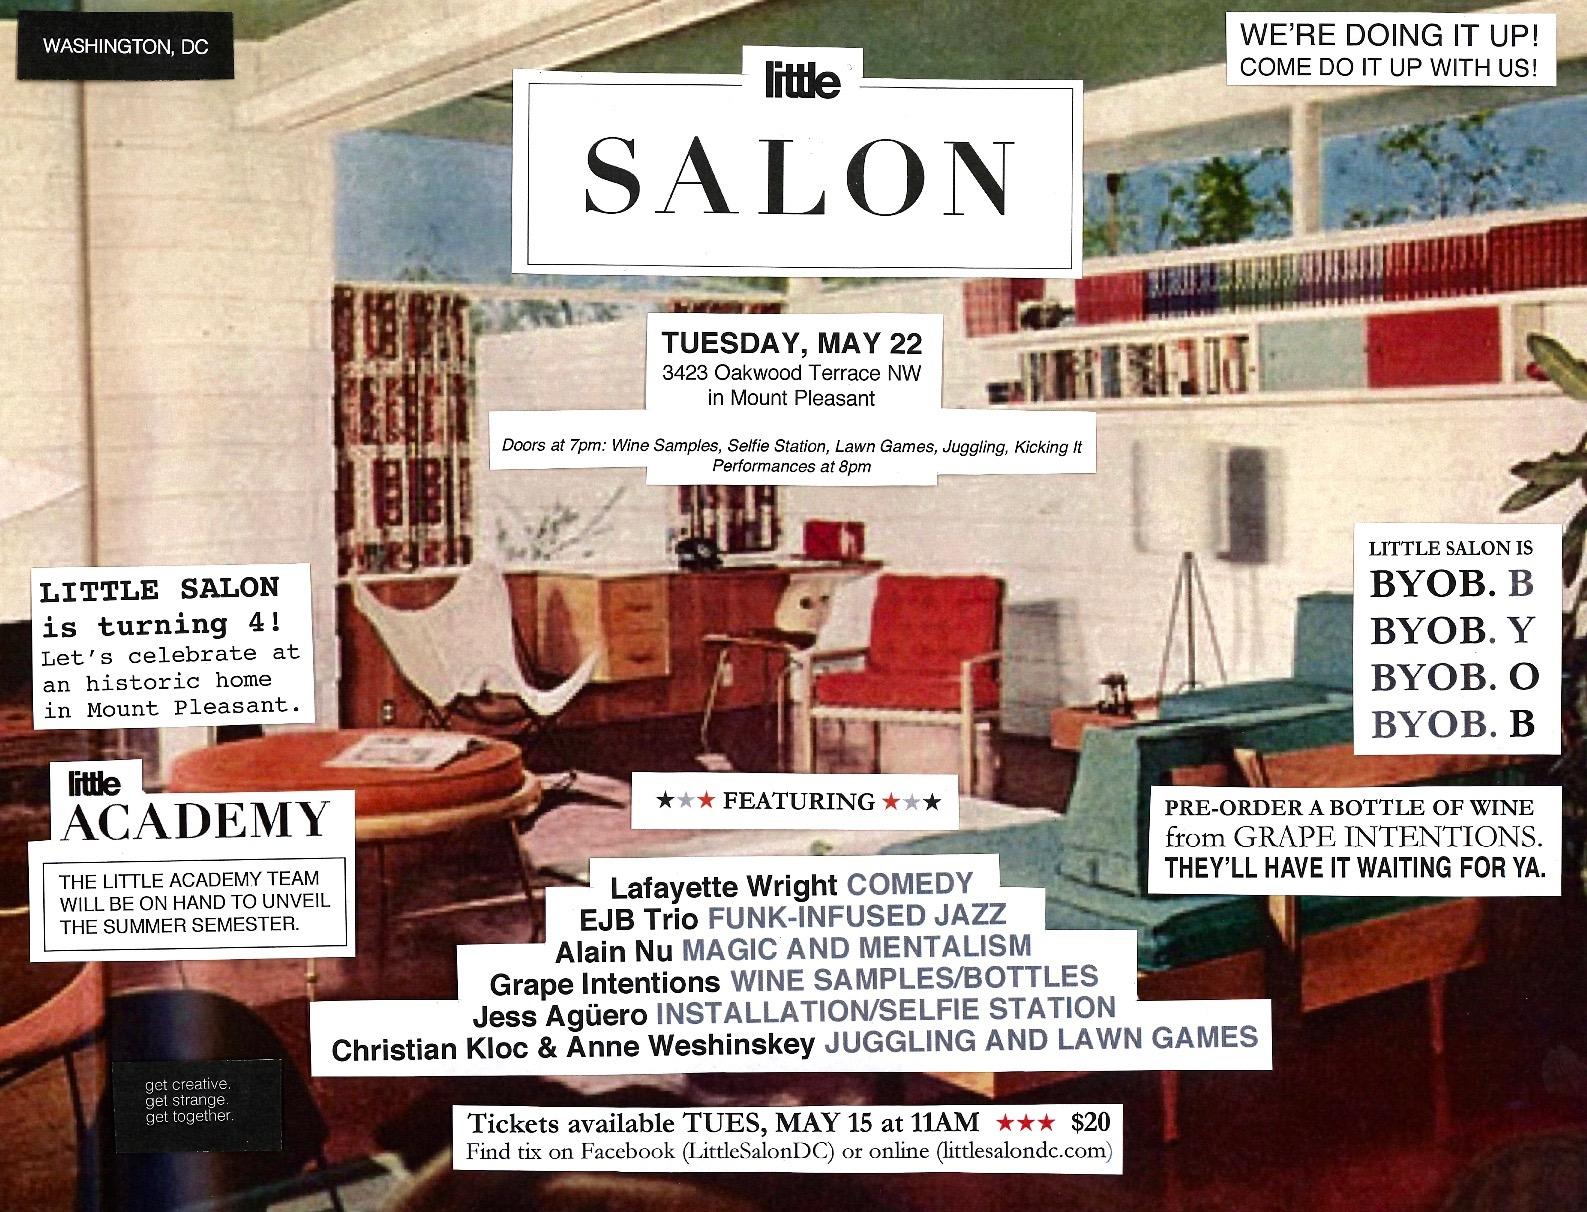 Little Salon